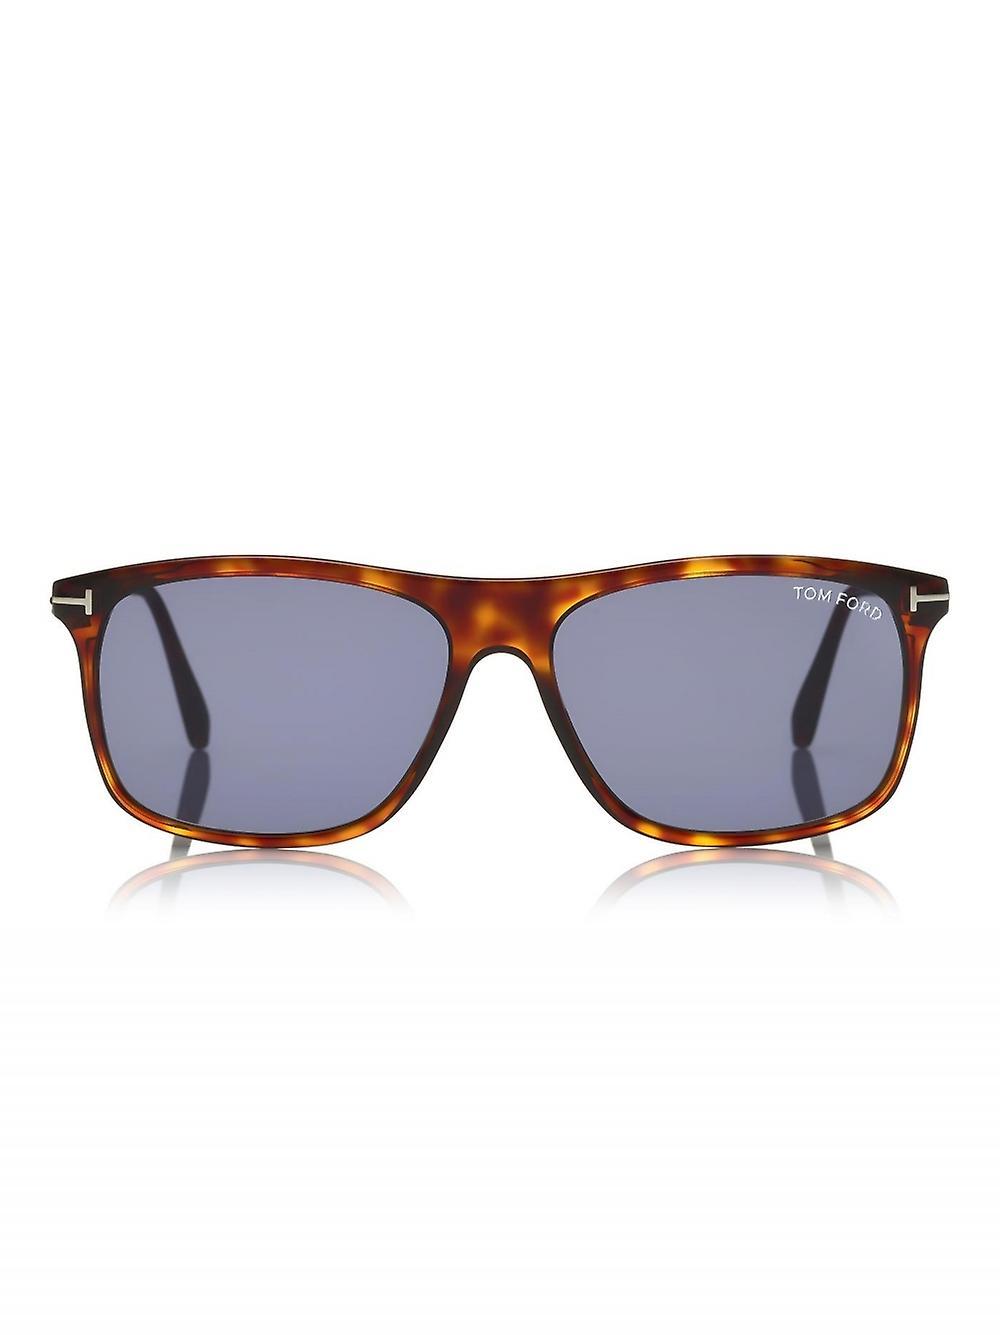 091c54a9d790a Tom Ford Tom Ford Shiny Black   Gold Carlo Sunglasses